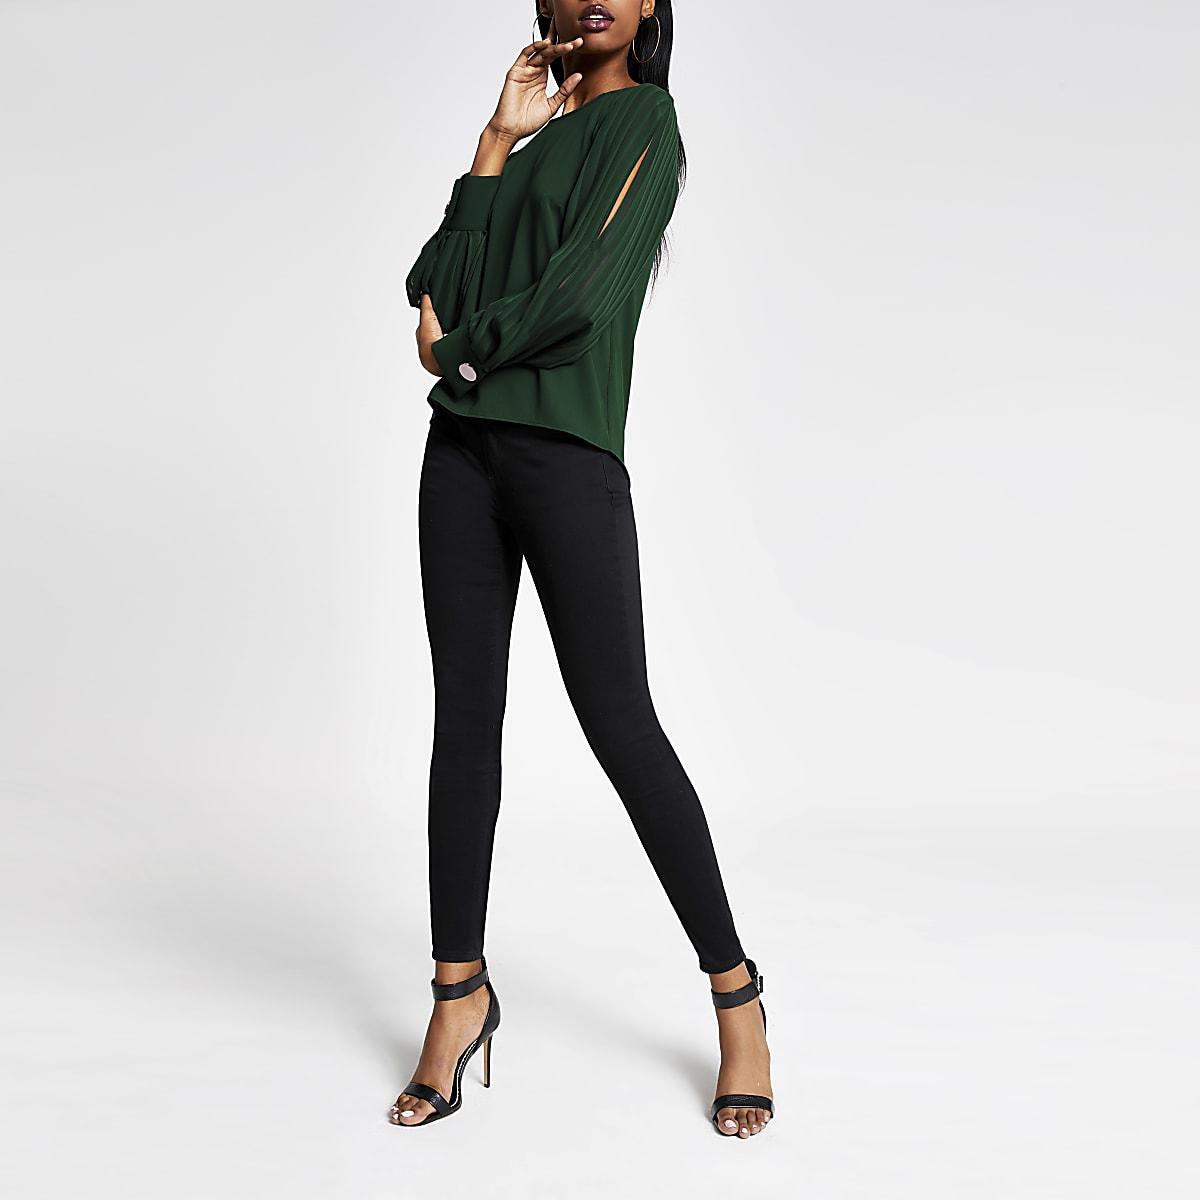 Green long sheer stripe split sleeve top